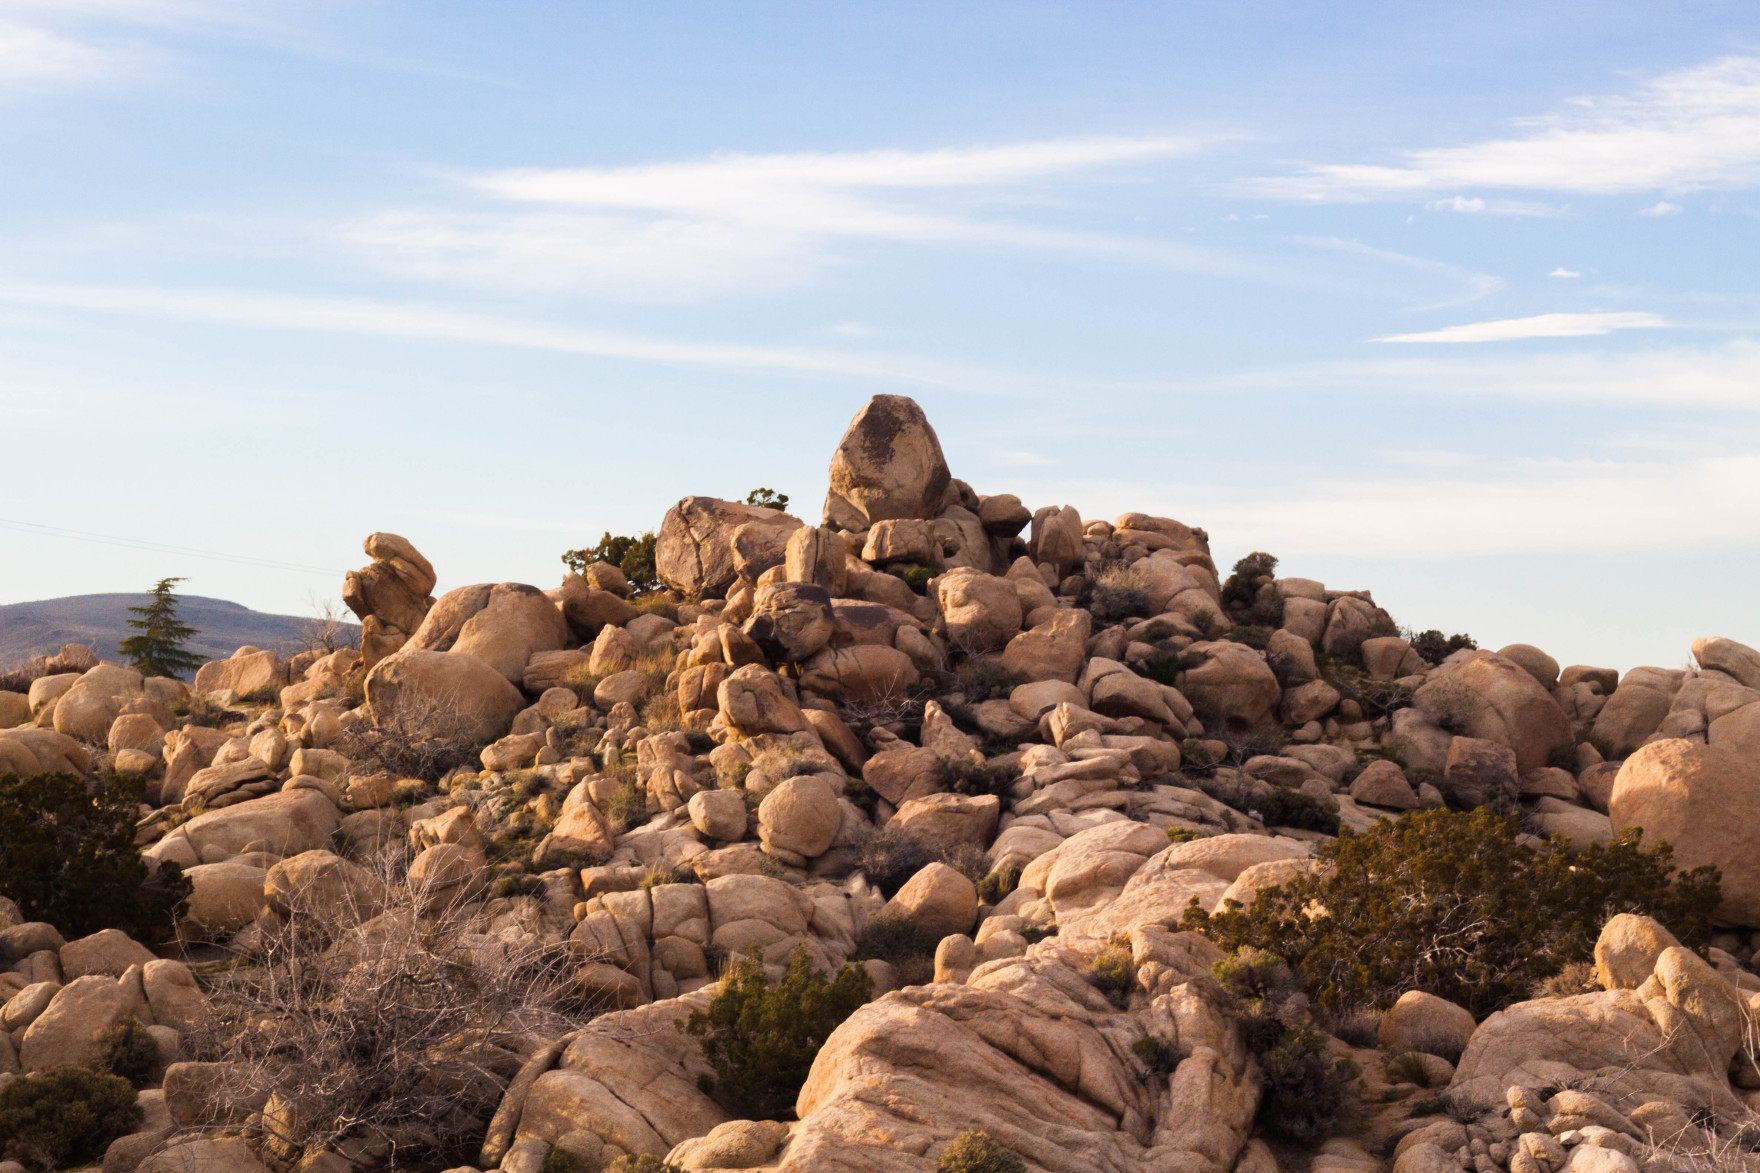 Bored Vegetarian Bethany Pickard Yucca Valley Joshua Tree Pile of Rocks-15